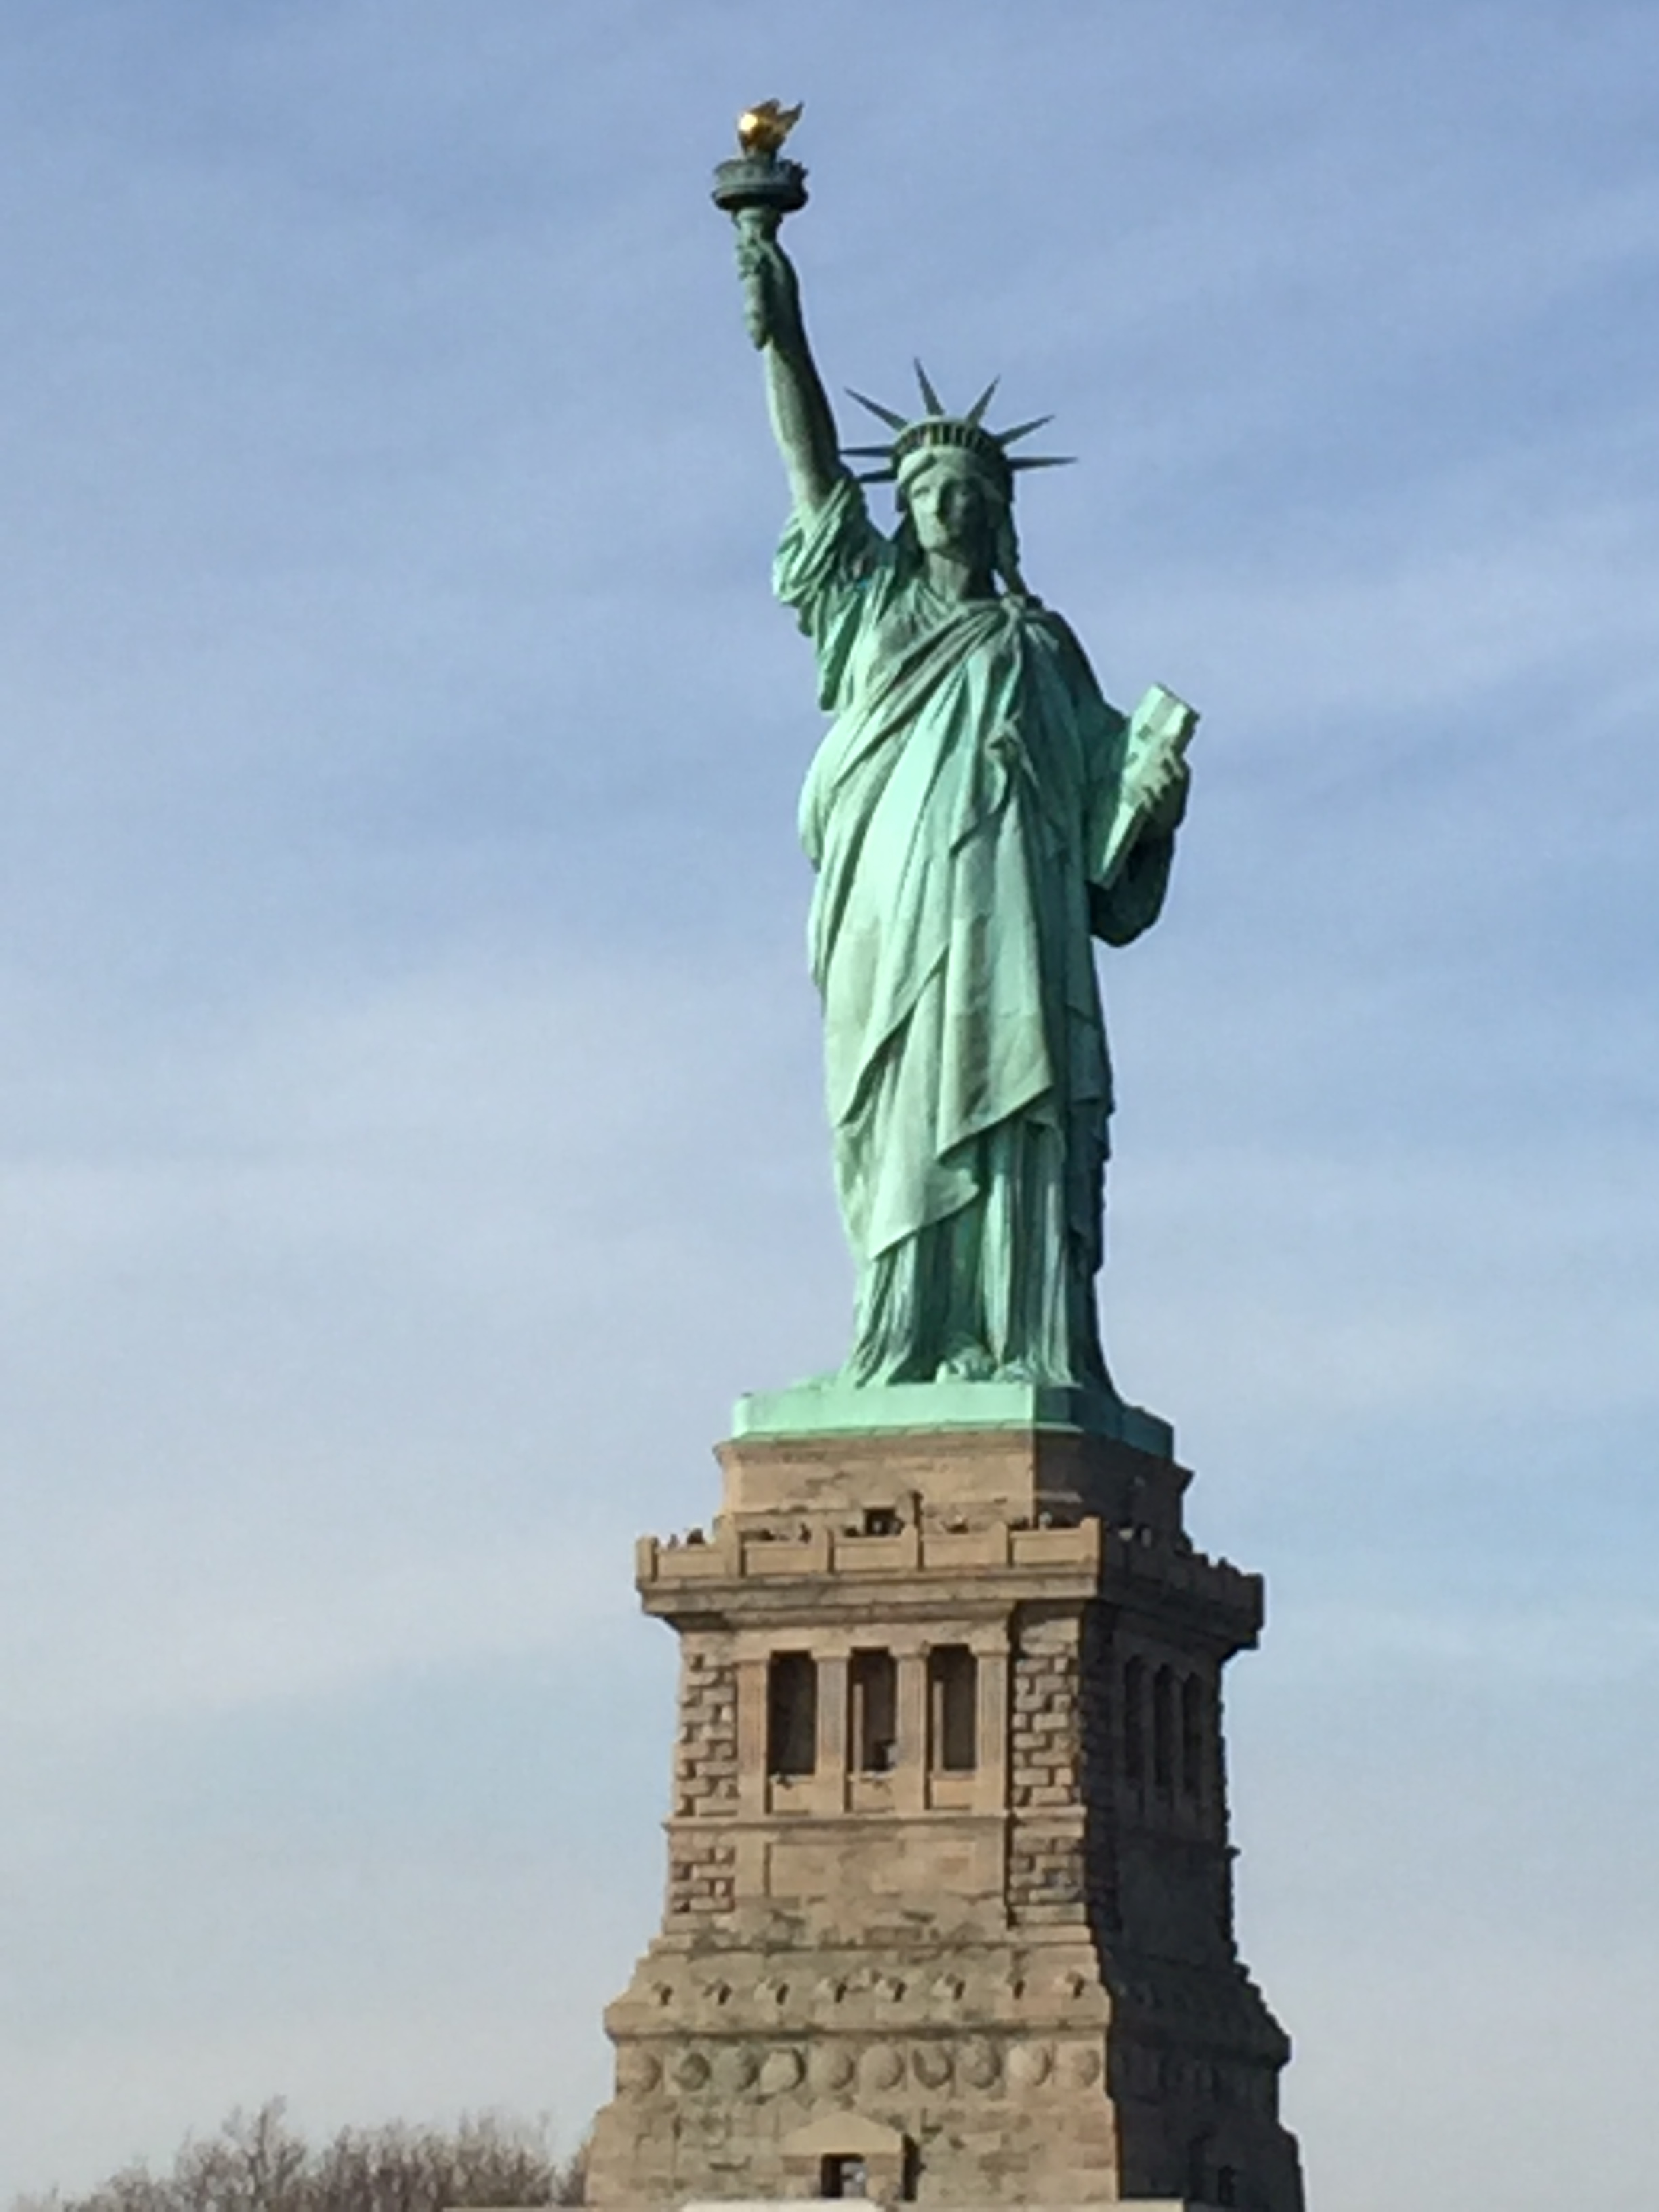 Apple Wallpaper Iphone 7 Free Stock Photo Of Ellis Island Lady Liberty New York